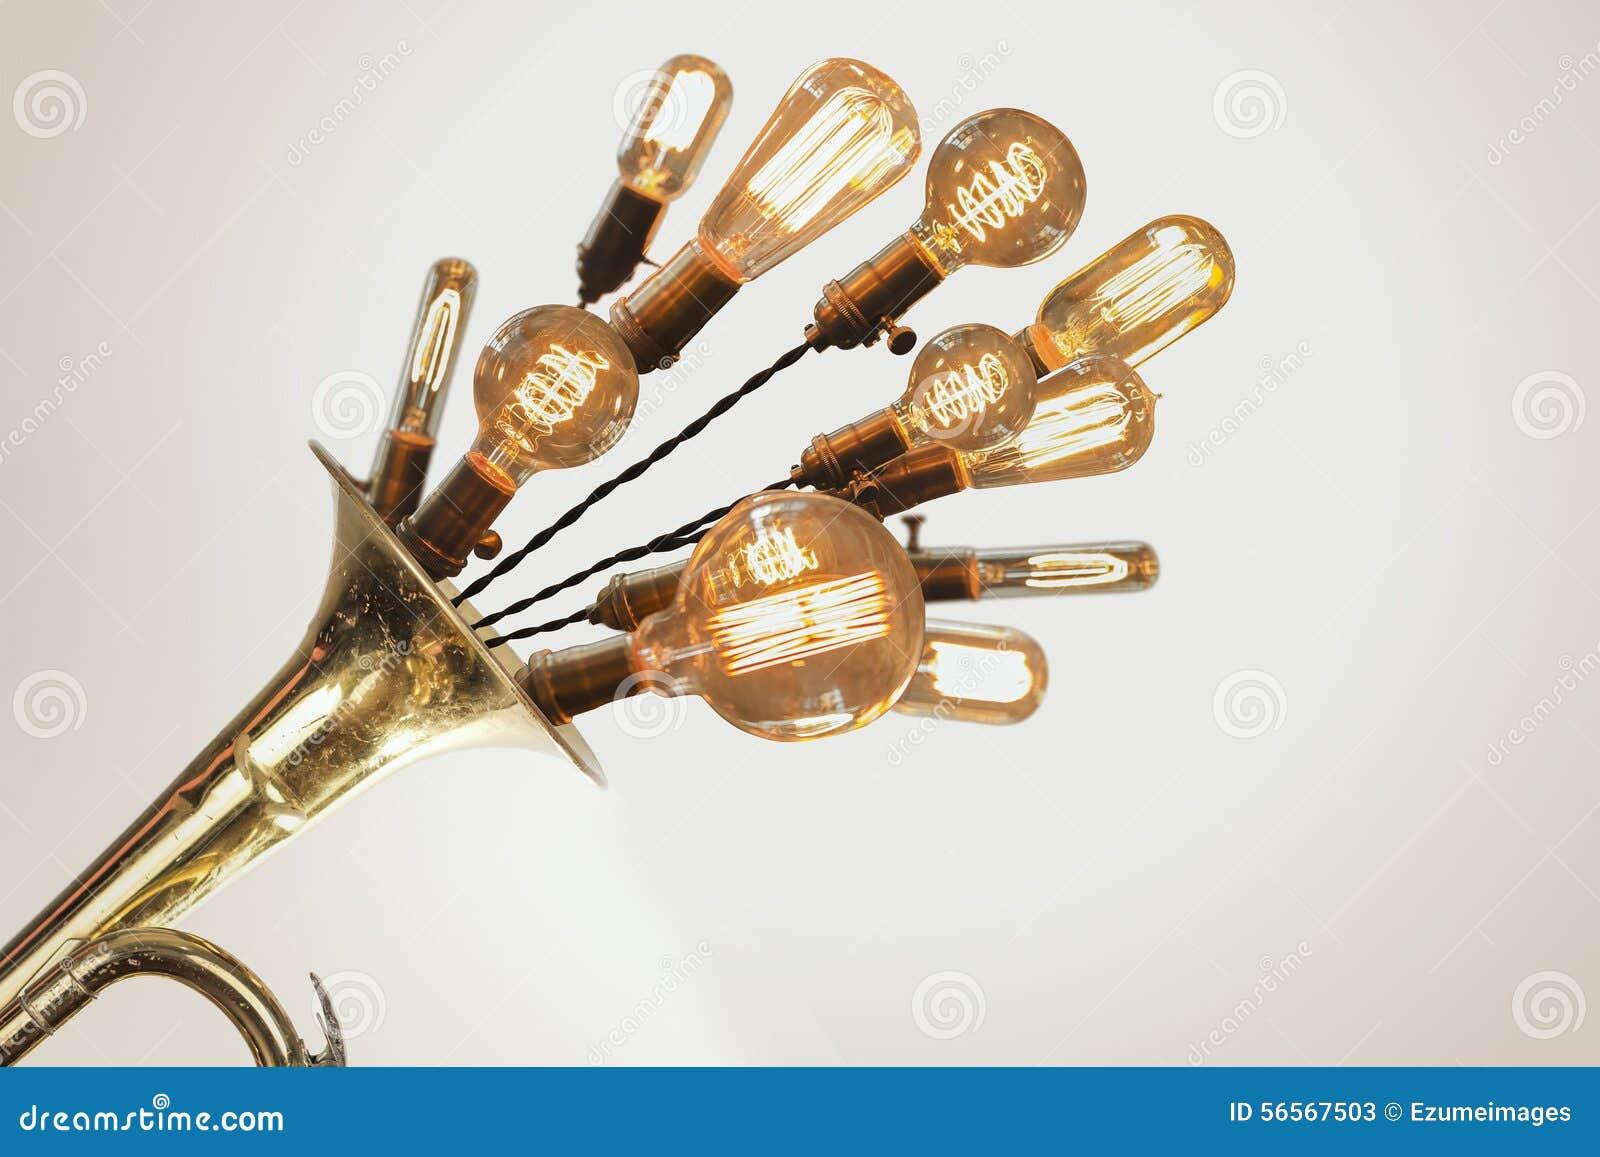 Download Edison Lightbulbs Trumpet στοκ εικόνα. εικόνα από βαθουλωμένος - 56567503